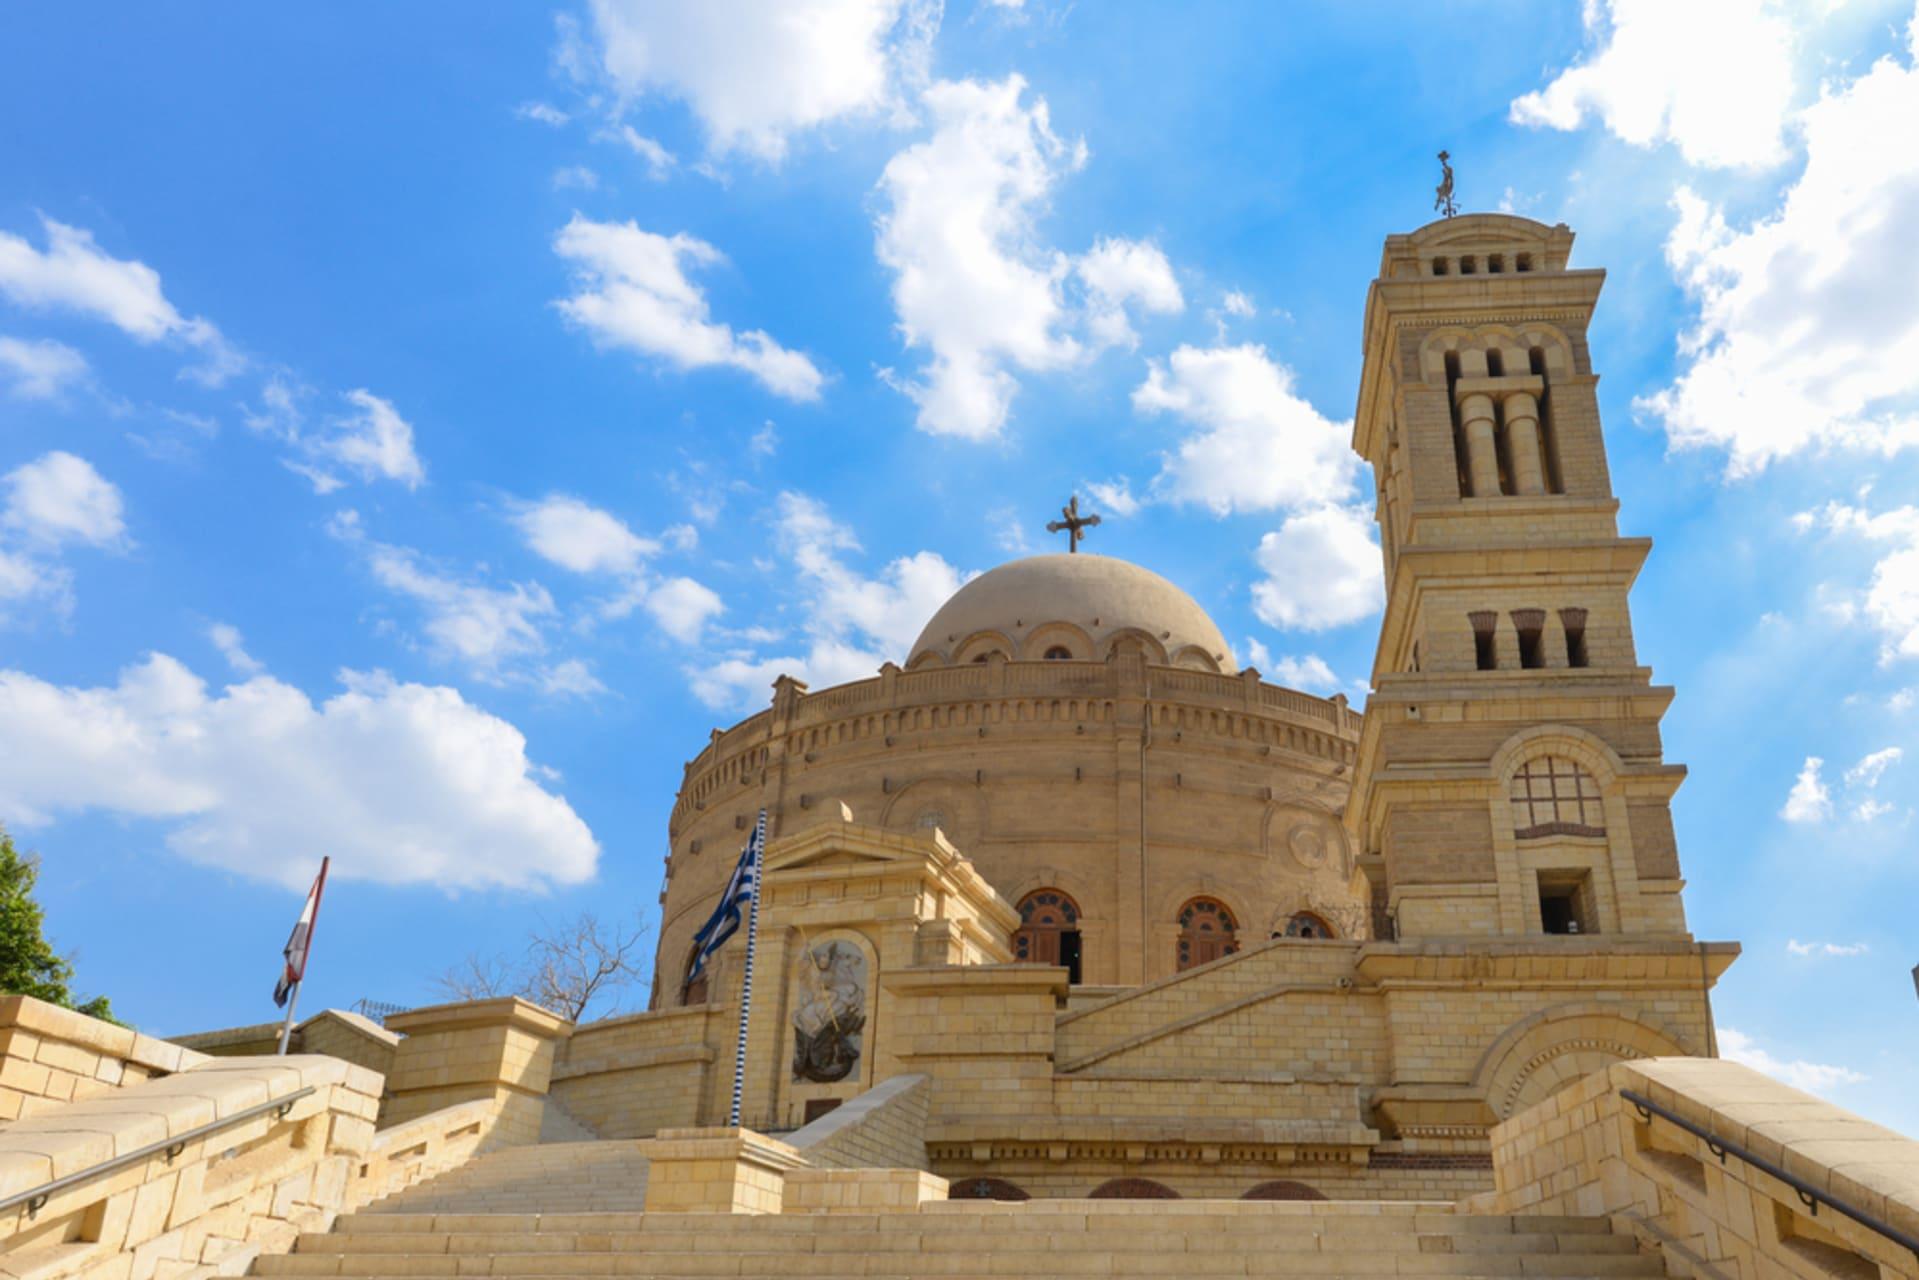 Cairo - Coptic Cairo